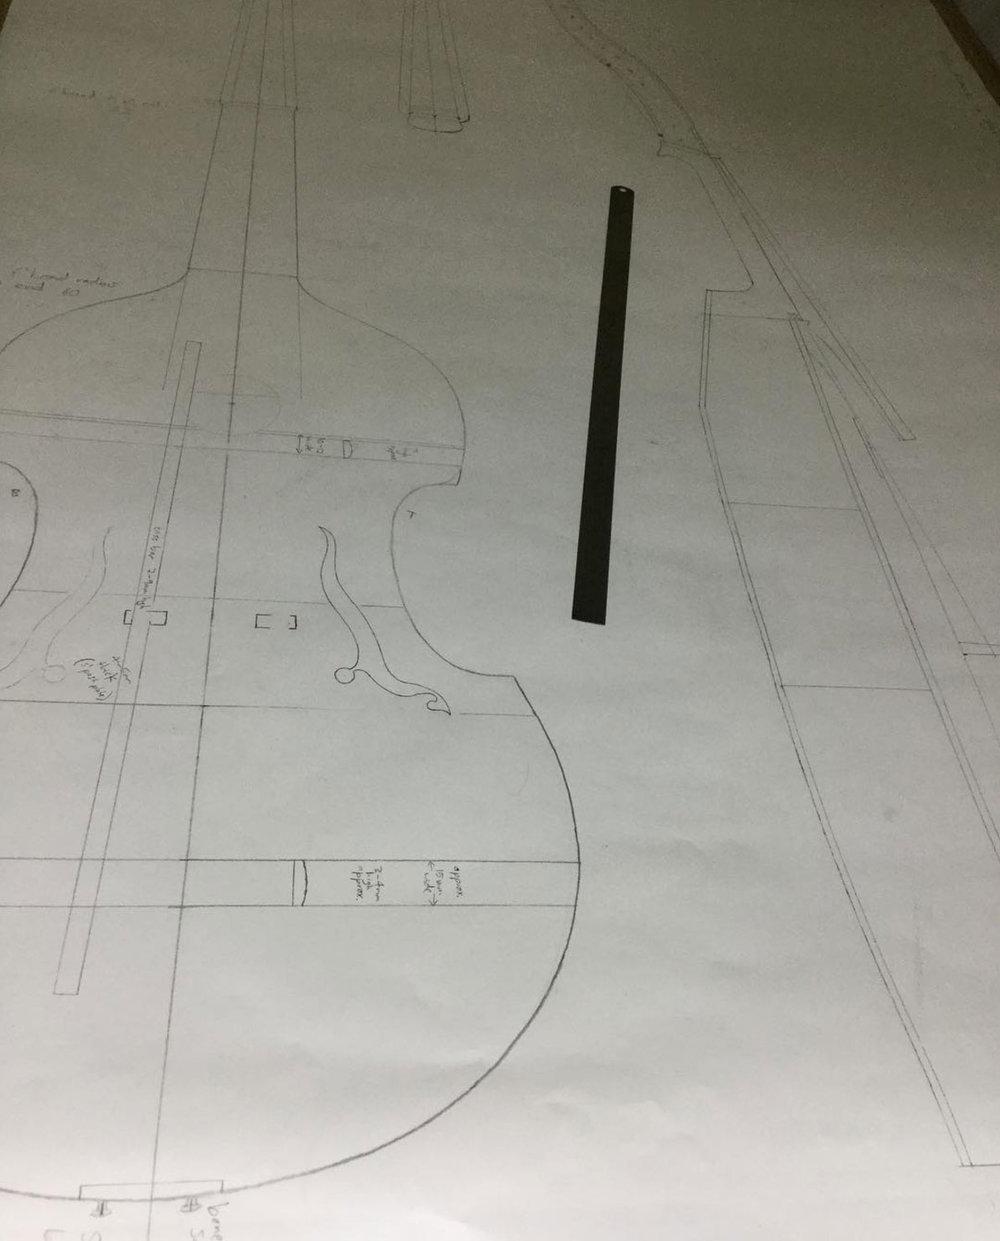 Jonathan_Hill_violadamore_diagram_01.jpg